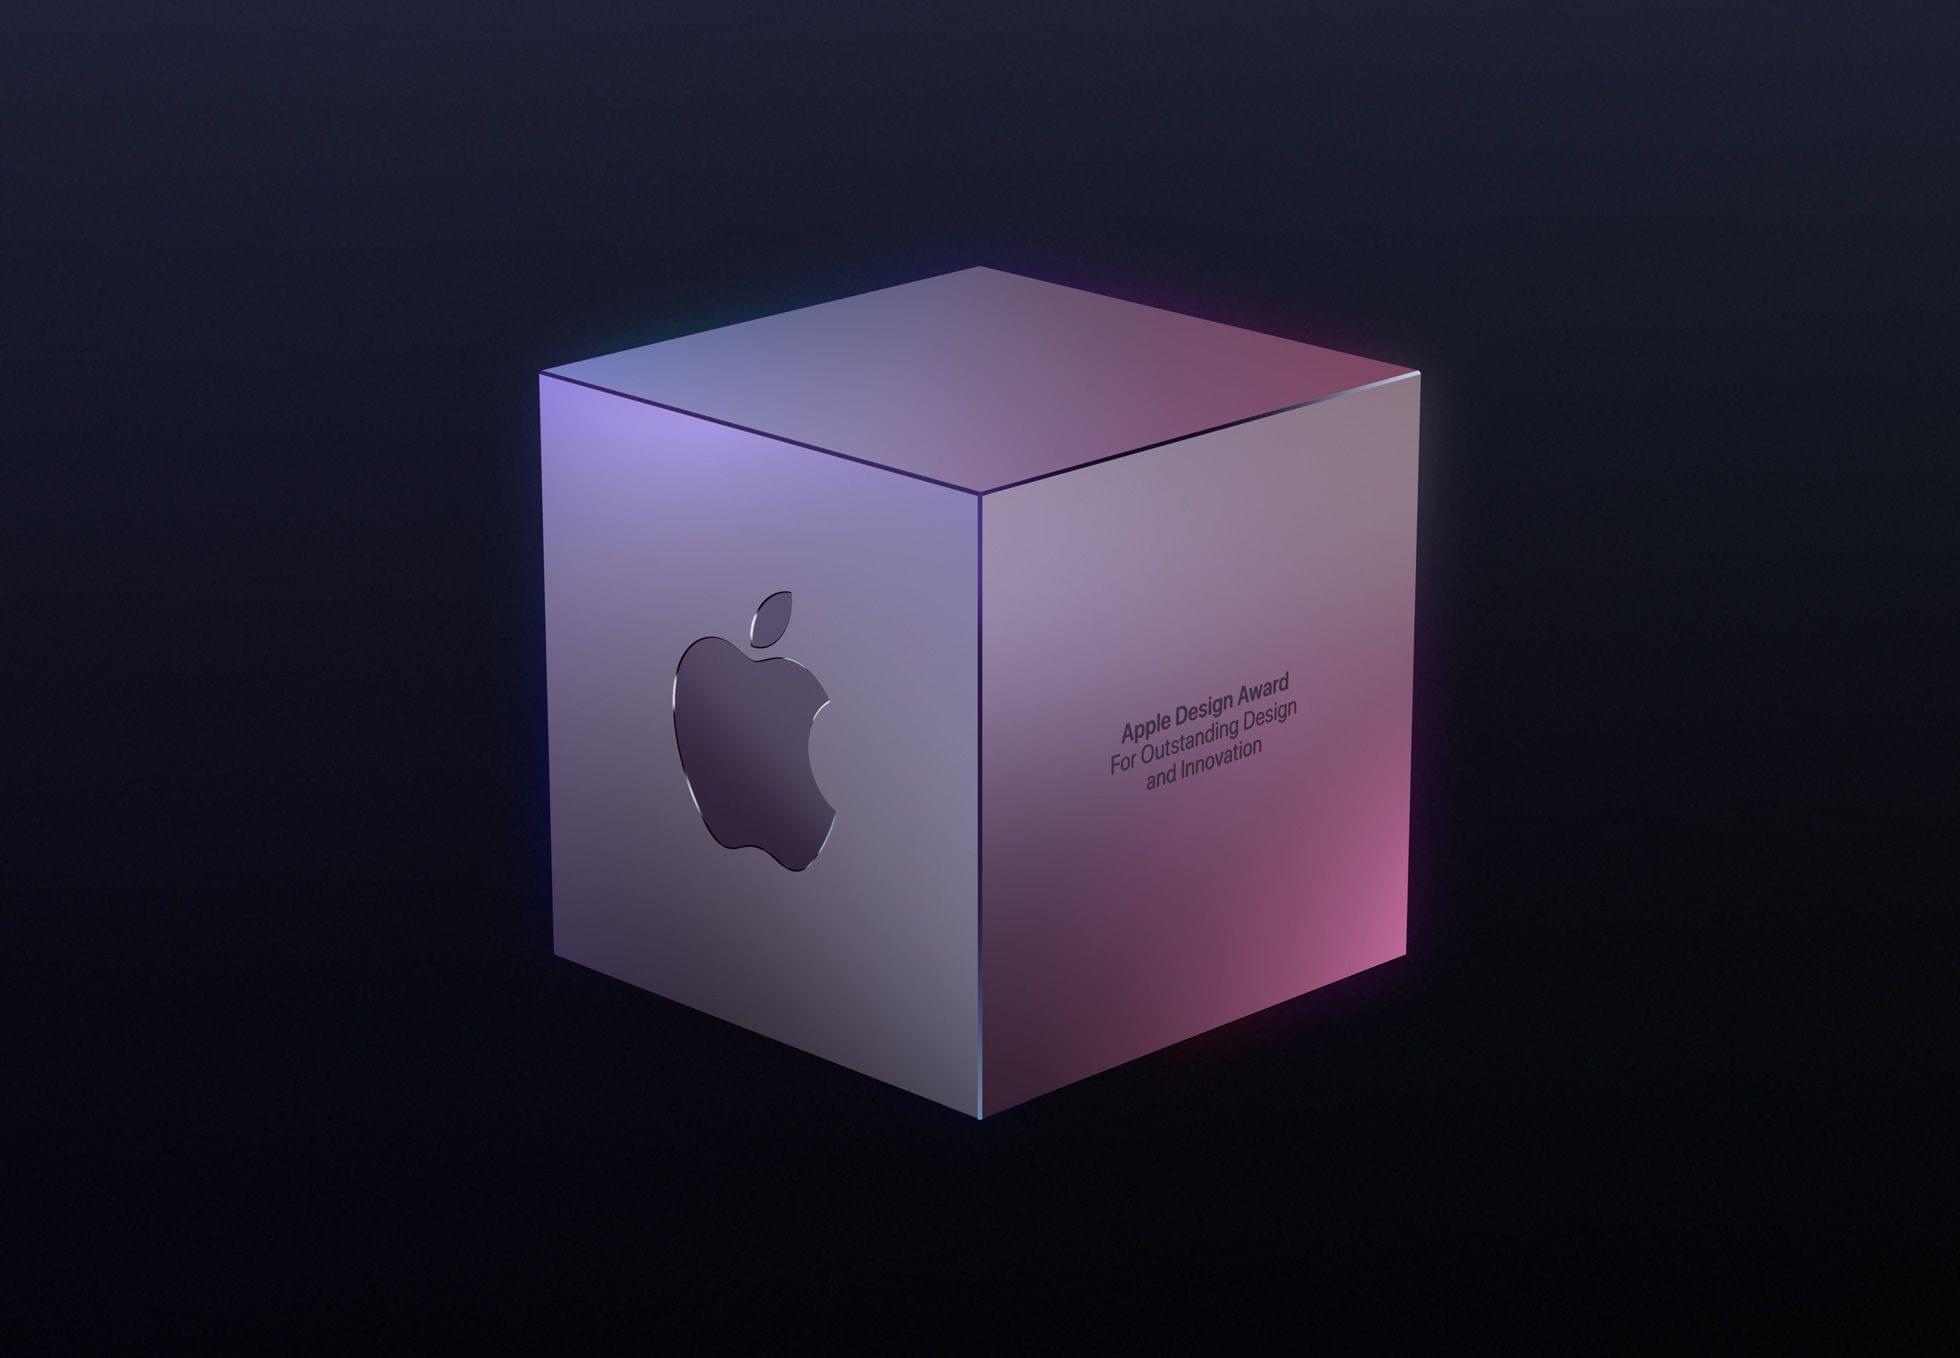 photo of 2021 Apple Design Awards Given to Twelve Developers image